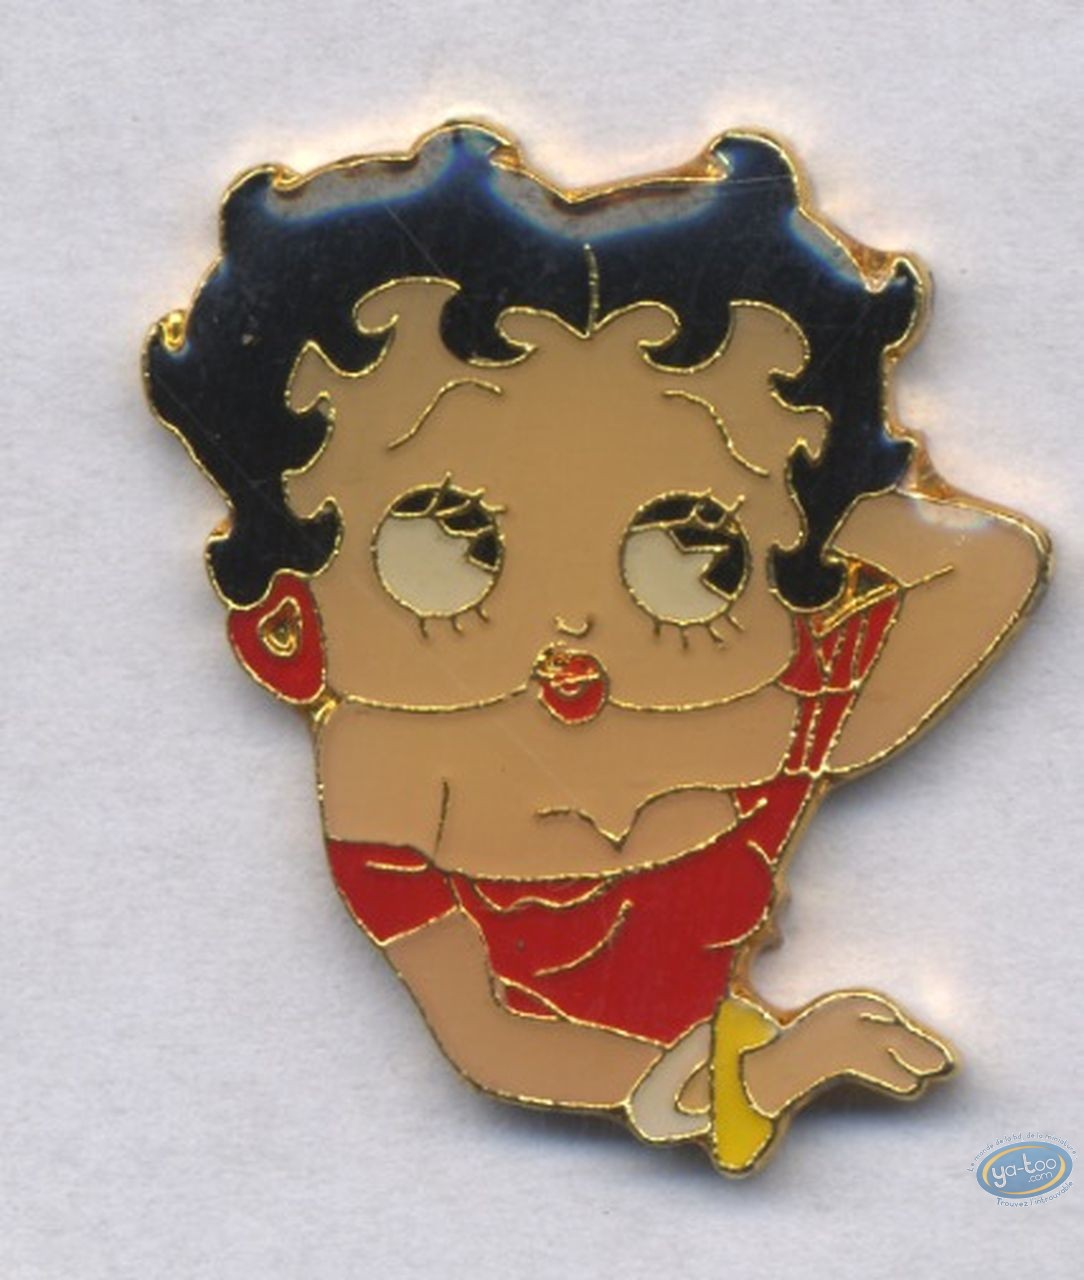 Pin's, Betty Boop : Pin's, Betty Boop : Portrait